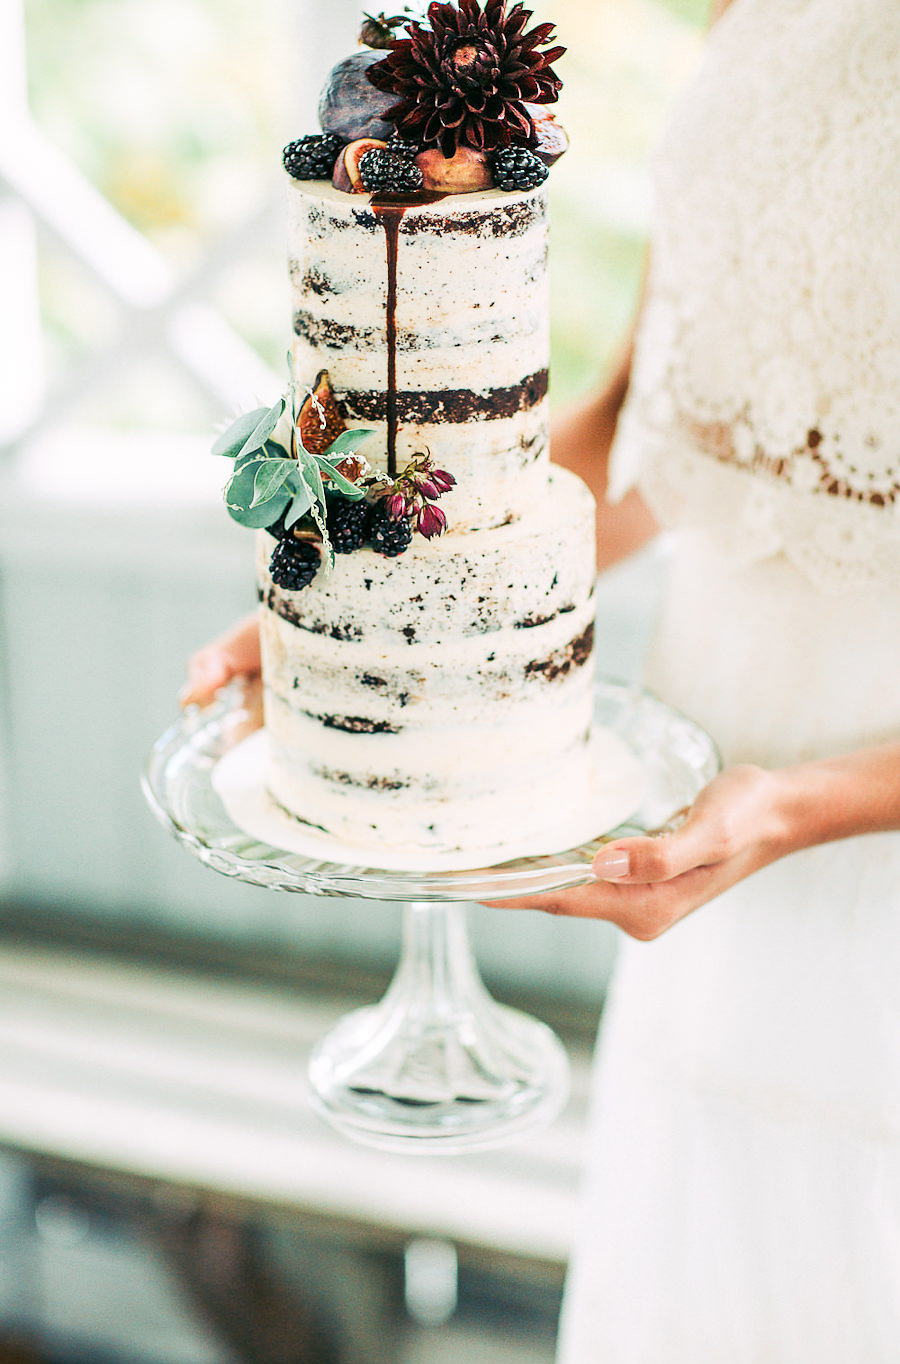 PetraVeikkola_Gaggui Wedding Cake.jpg